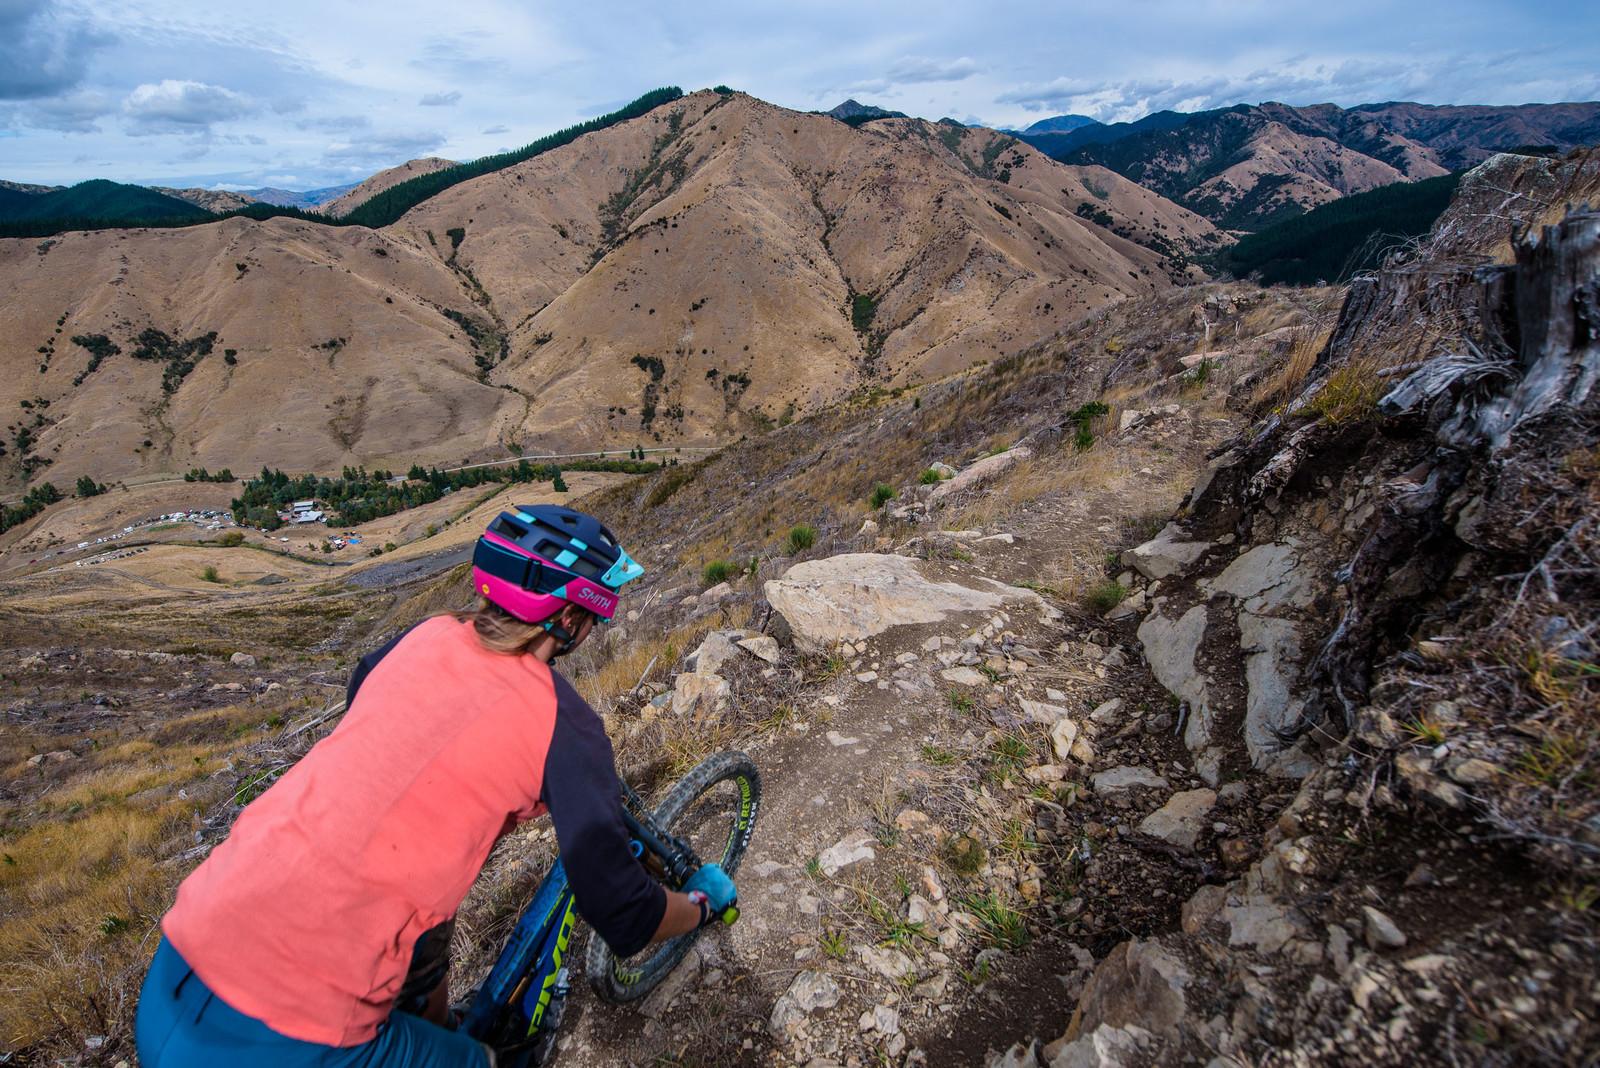 NZenduro19 day 3 DShaw-8353 - 2019 NZ Enduro Day 3 Photo Gallery - Mountain Biking Pictures - Vital MTB